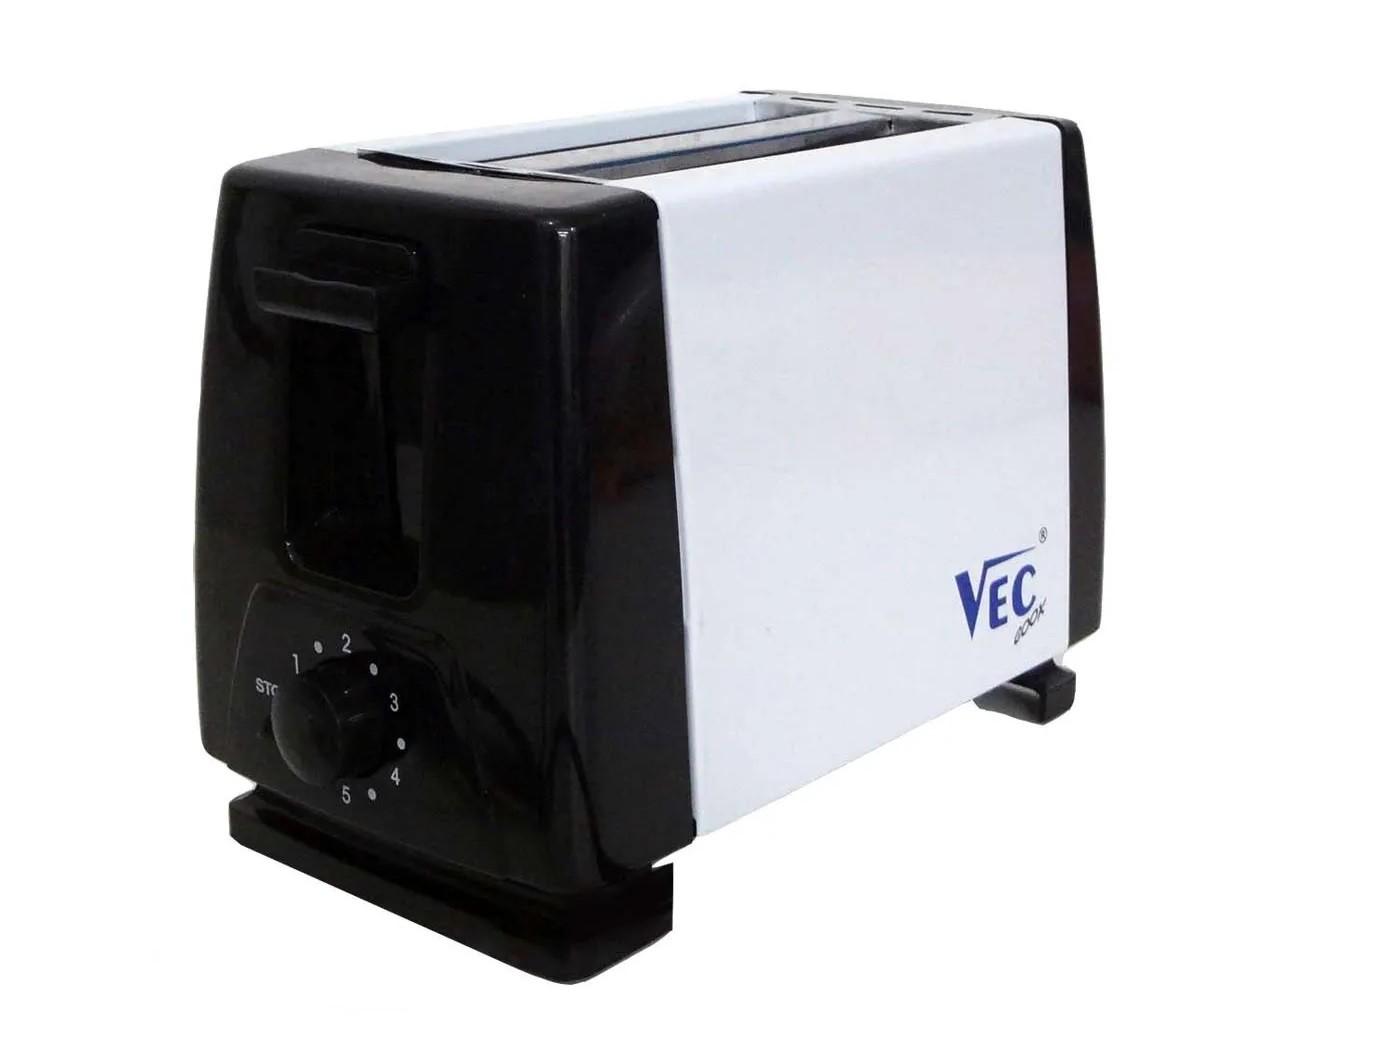 Torradeira Elétrica 750W 6 níveis TP-802B 220V Vec  - Mix Eletro